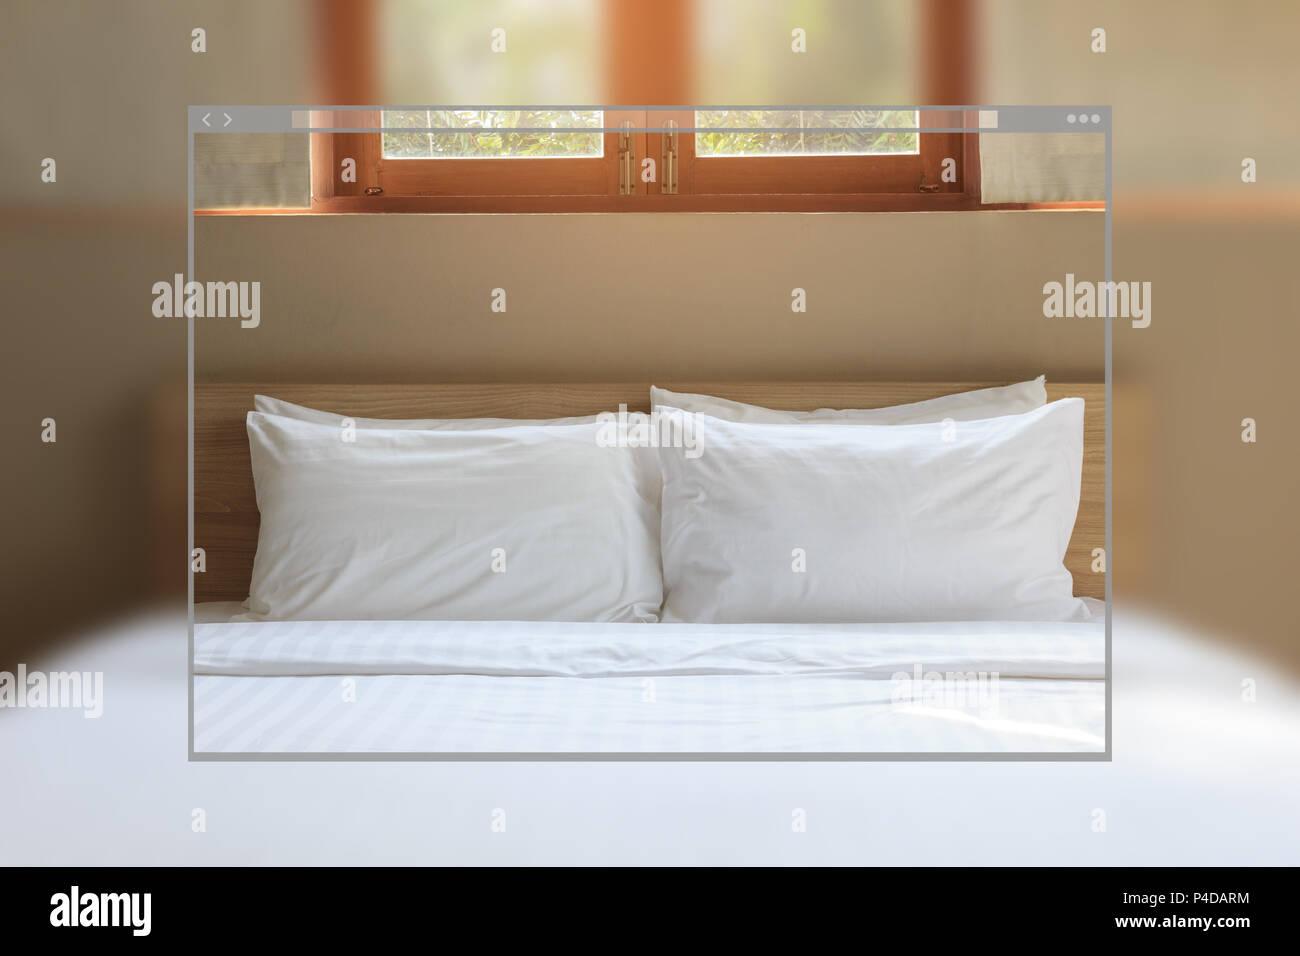 Web Site Page Design Concept Vintage Bedroom Interior Background Stock Photo Alamy